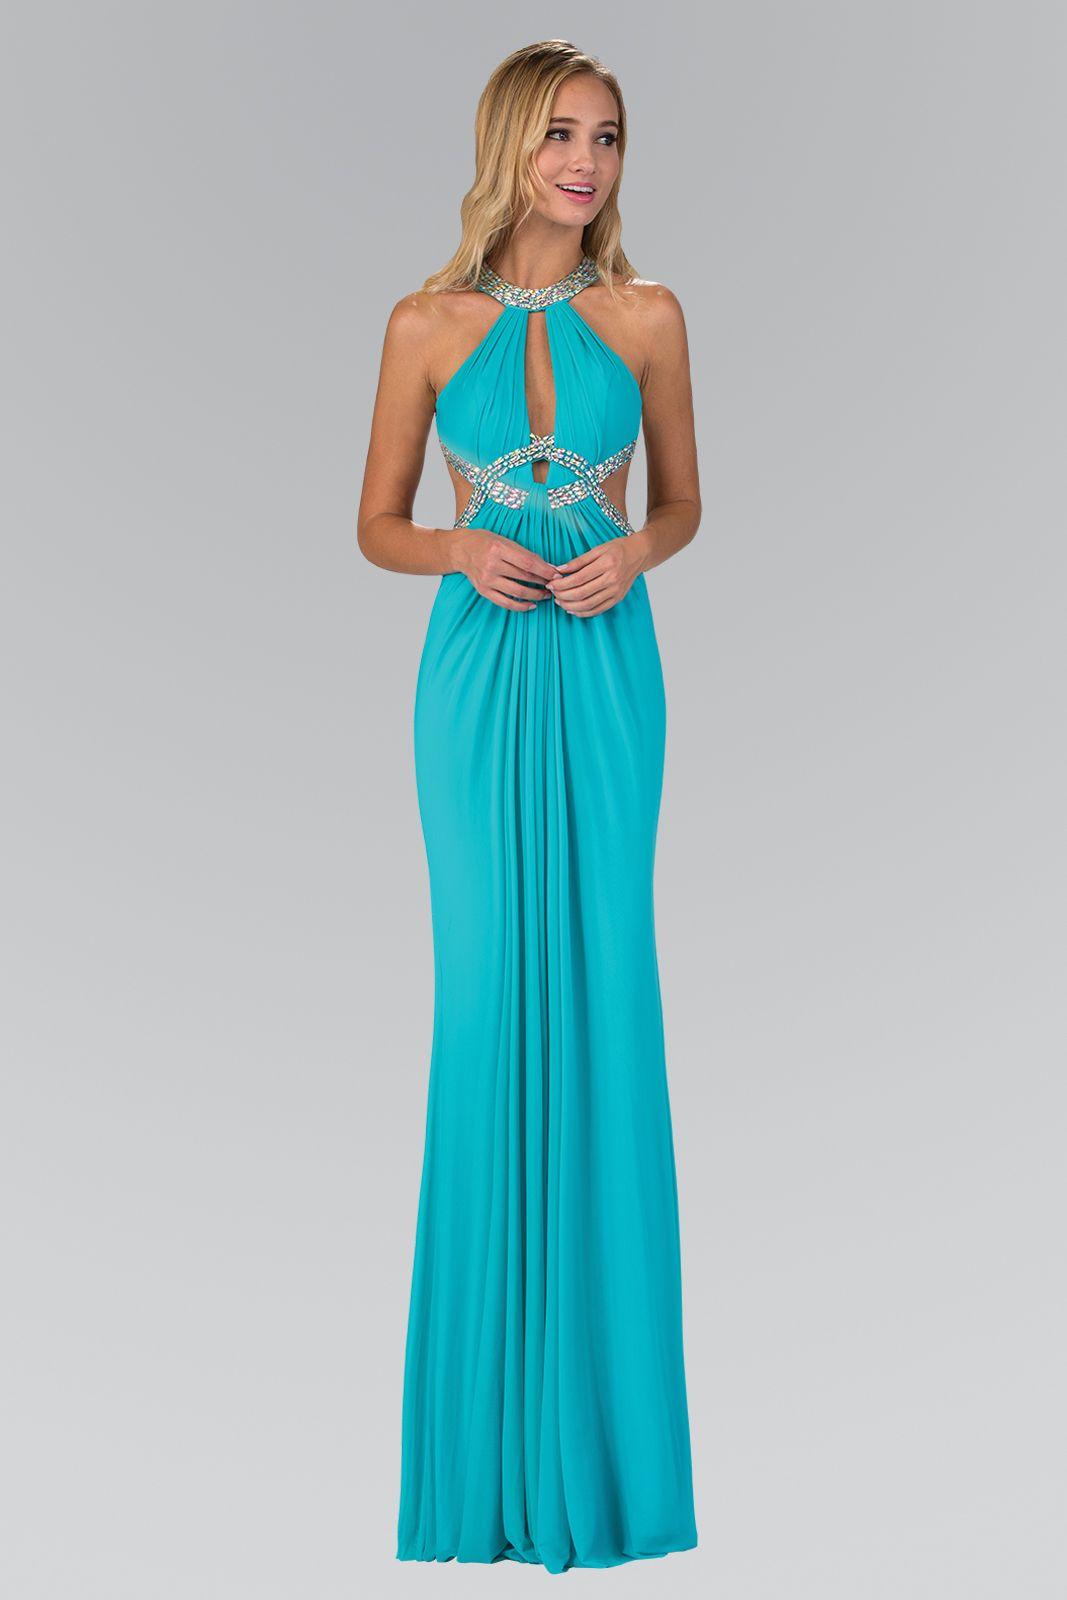 GLS APPAREL USA, INC - Dress Wholesale. GL2142 | Colors of the ...